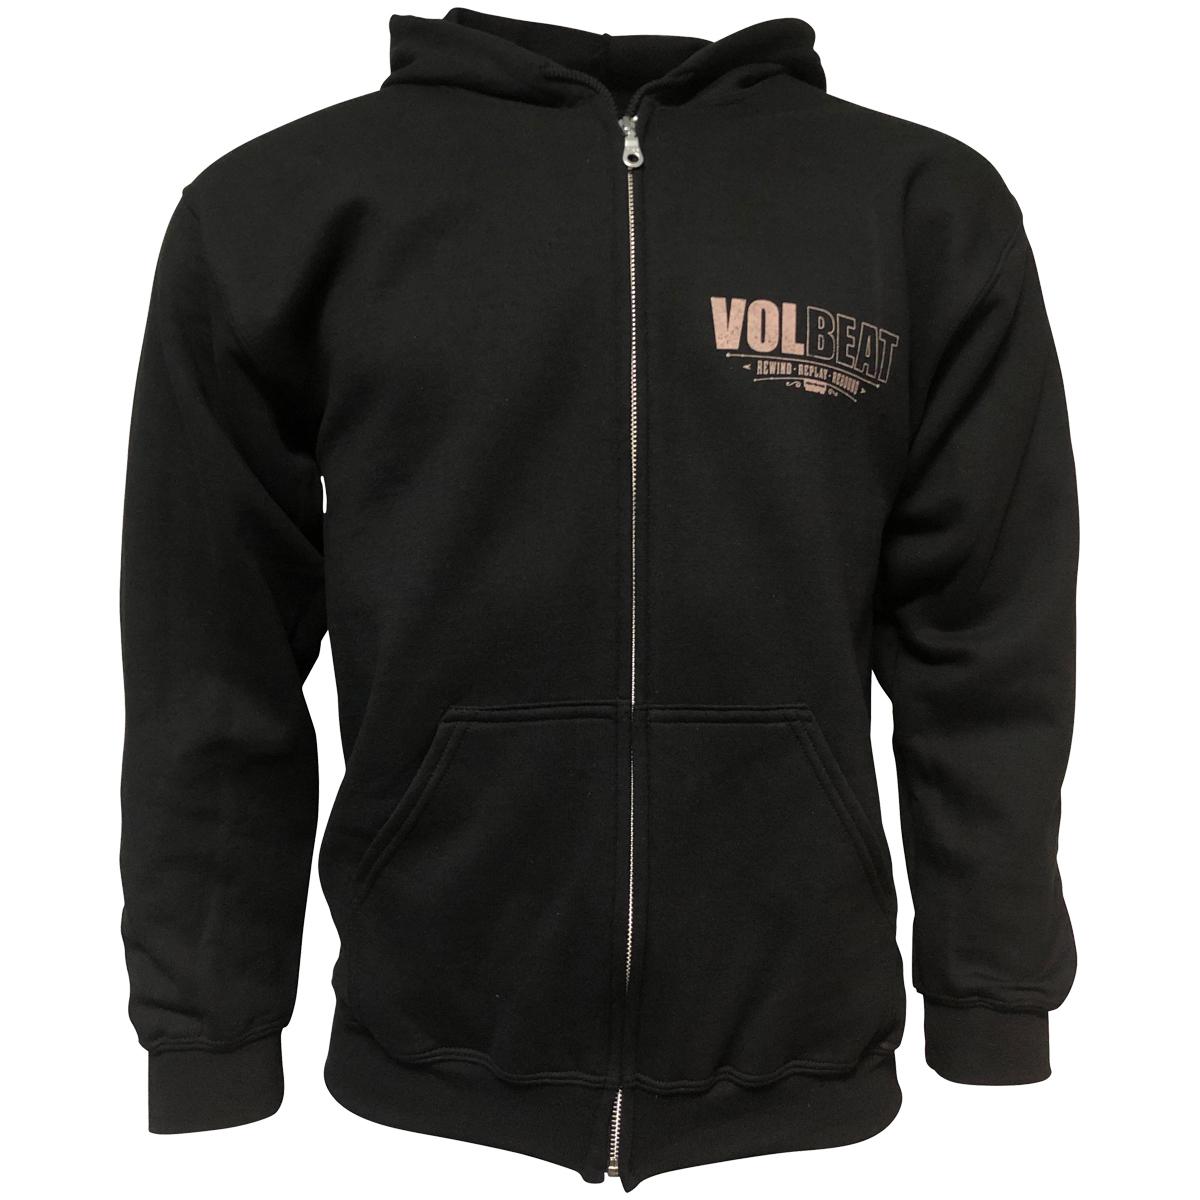 Volbeat - Kapuzenjacke Rewind Replay Rebound Cover - schwarz